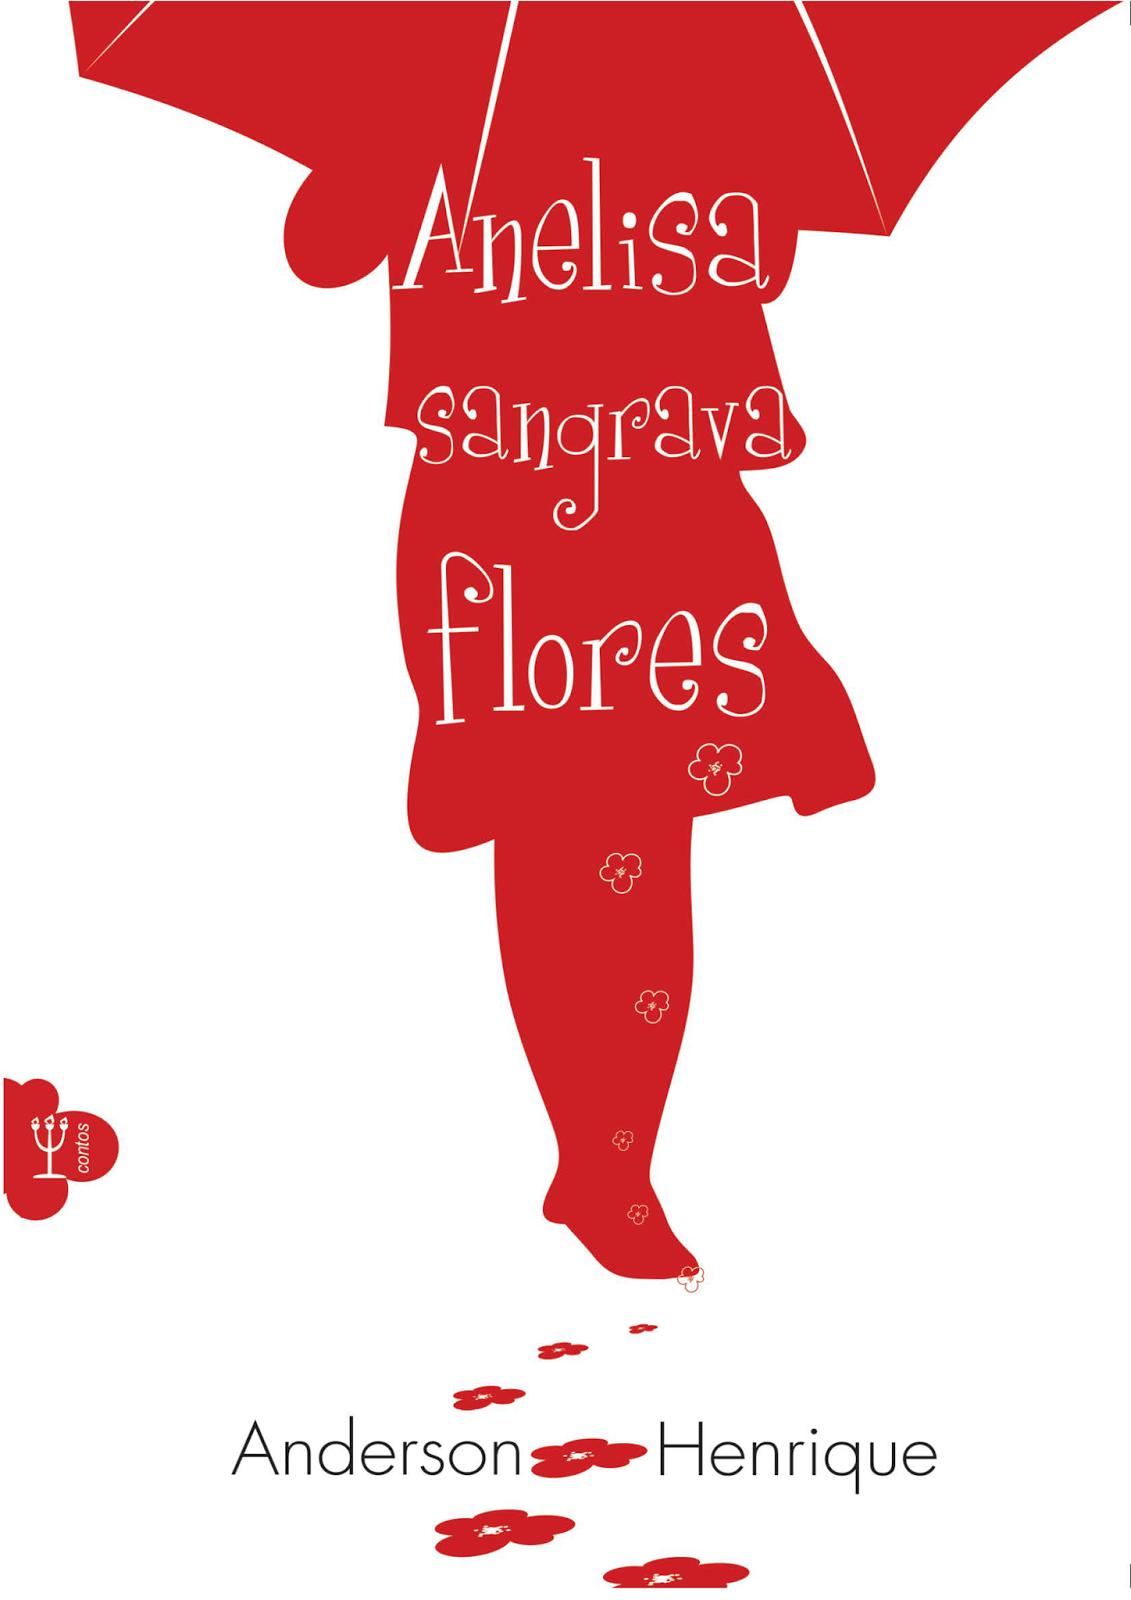 http://conjuntodaobra.blogspot.com.br/2014/09/anelisa-sangrava-flores-anderson.html